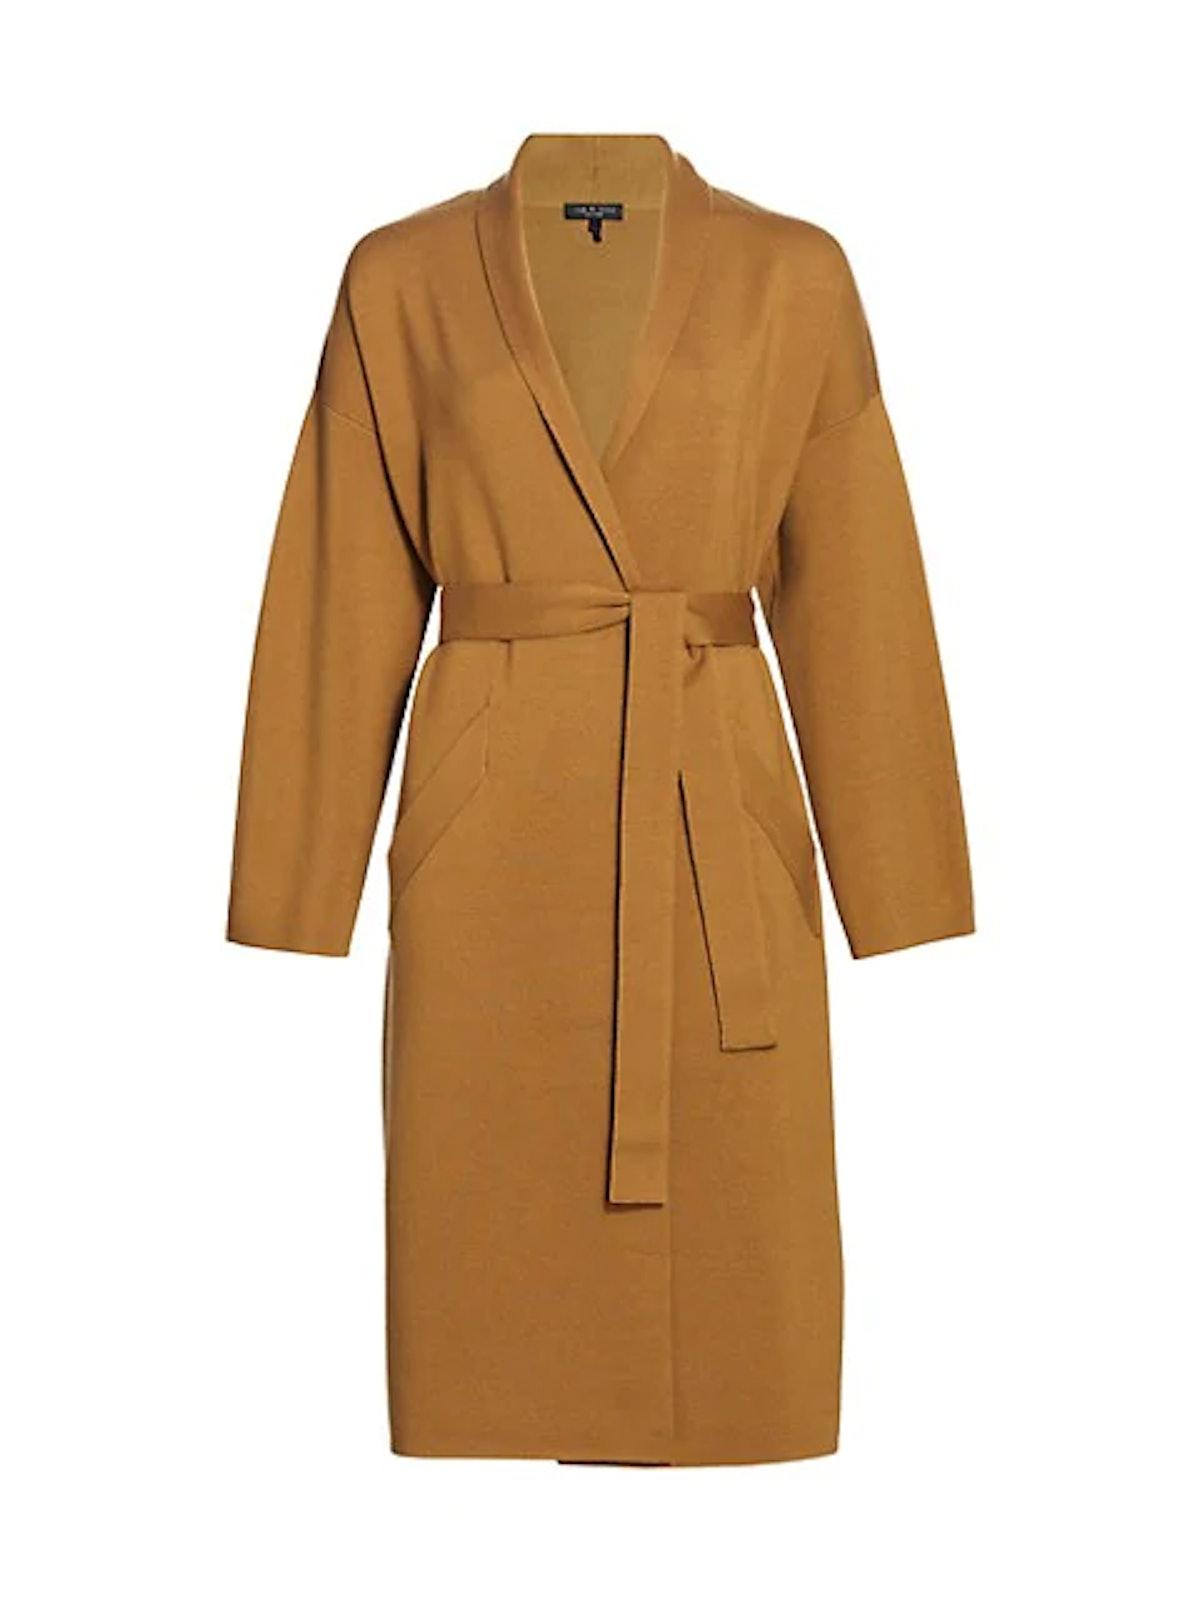 Emory Sweater Coat